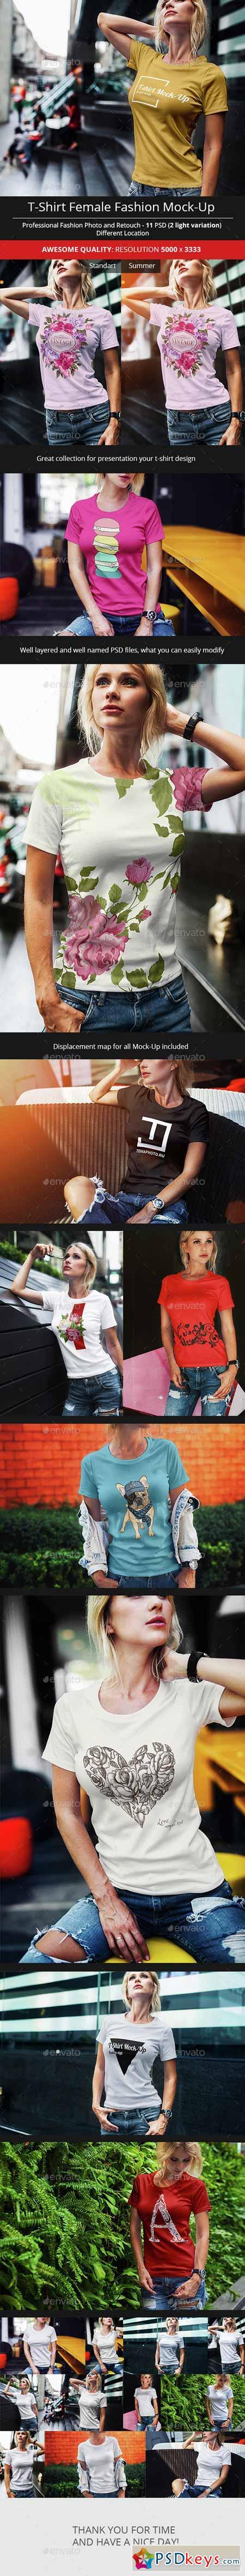 Female T-Shirt Fashion Mock-Up 14707045 » Free Download Photoshop